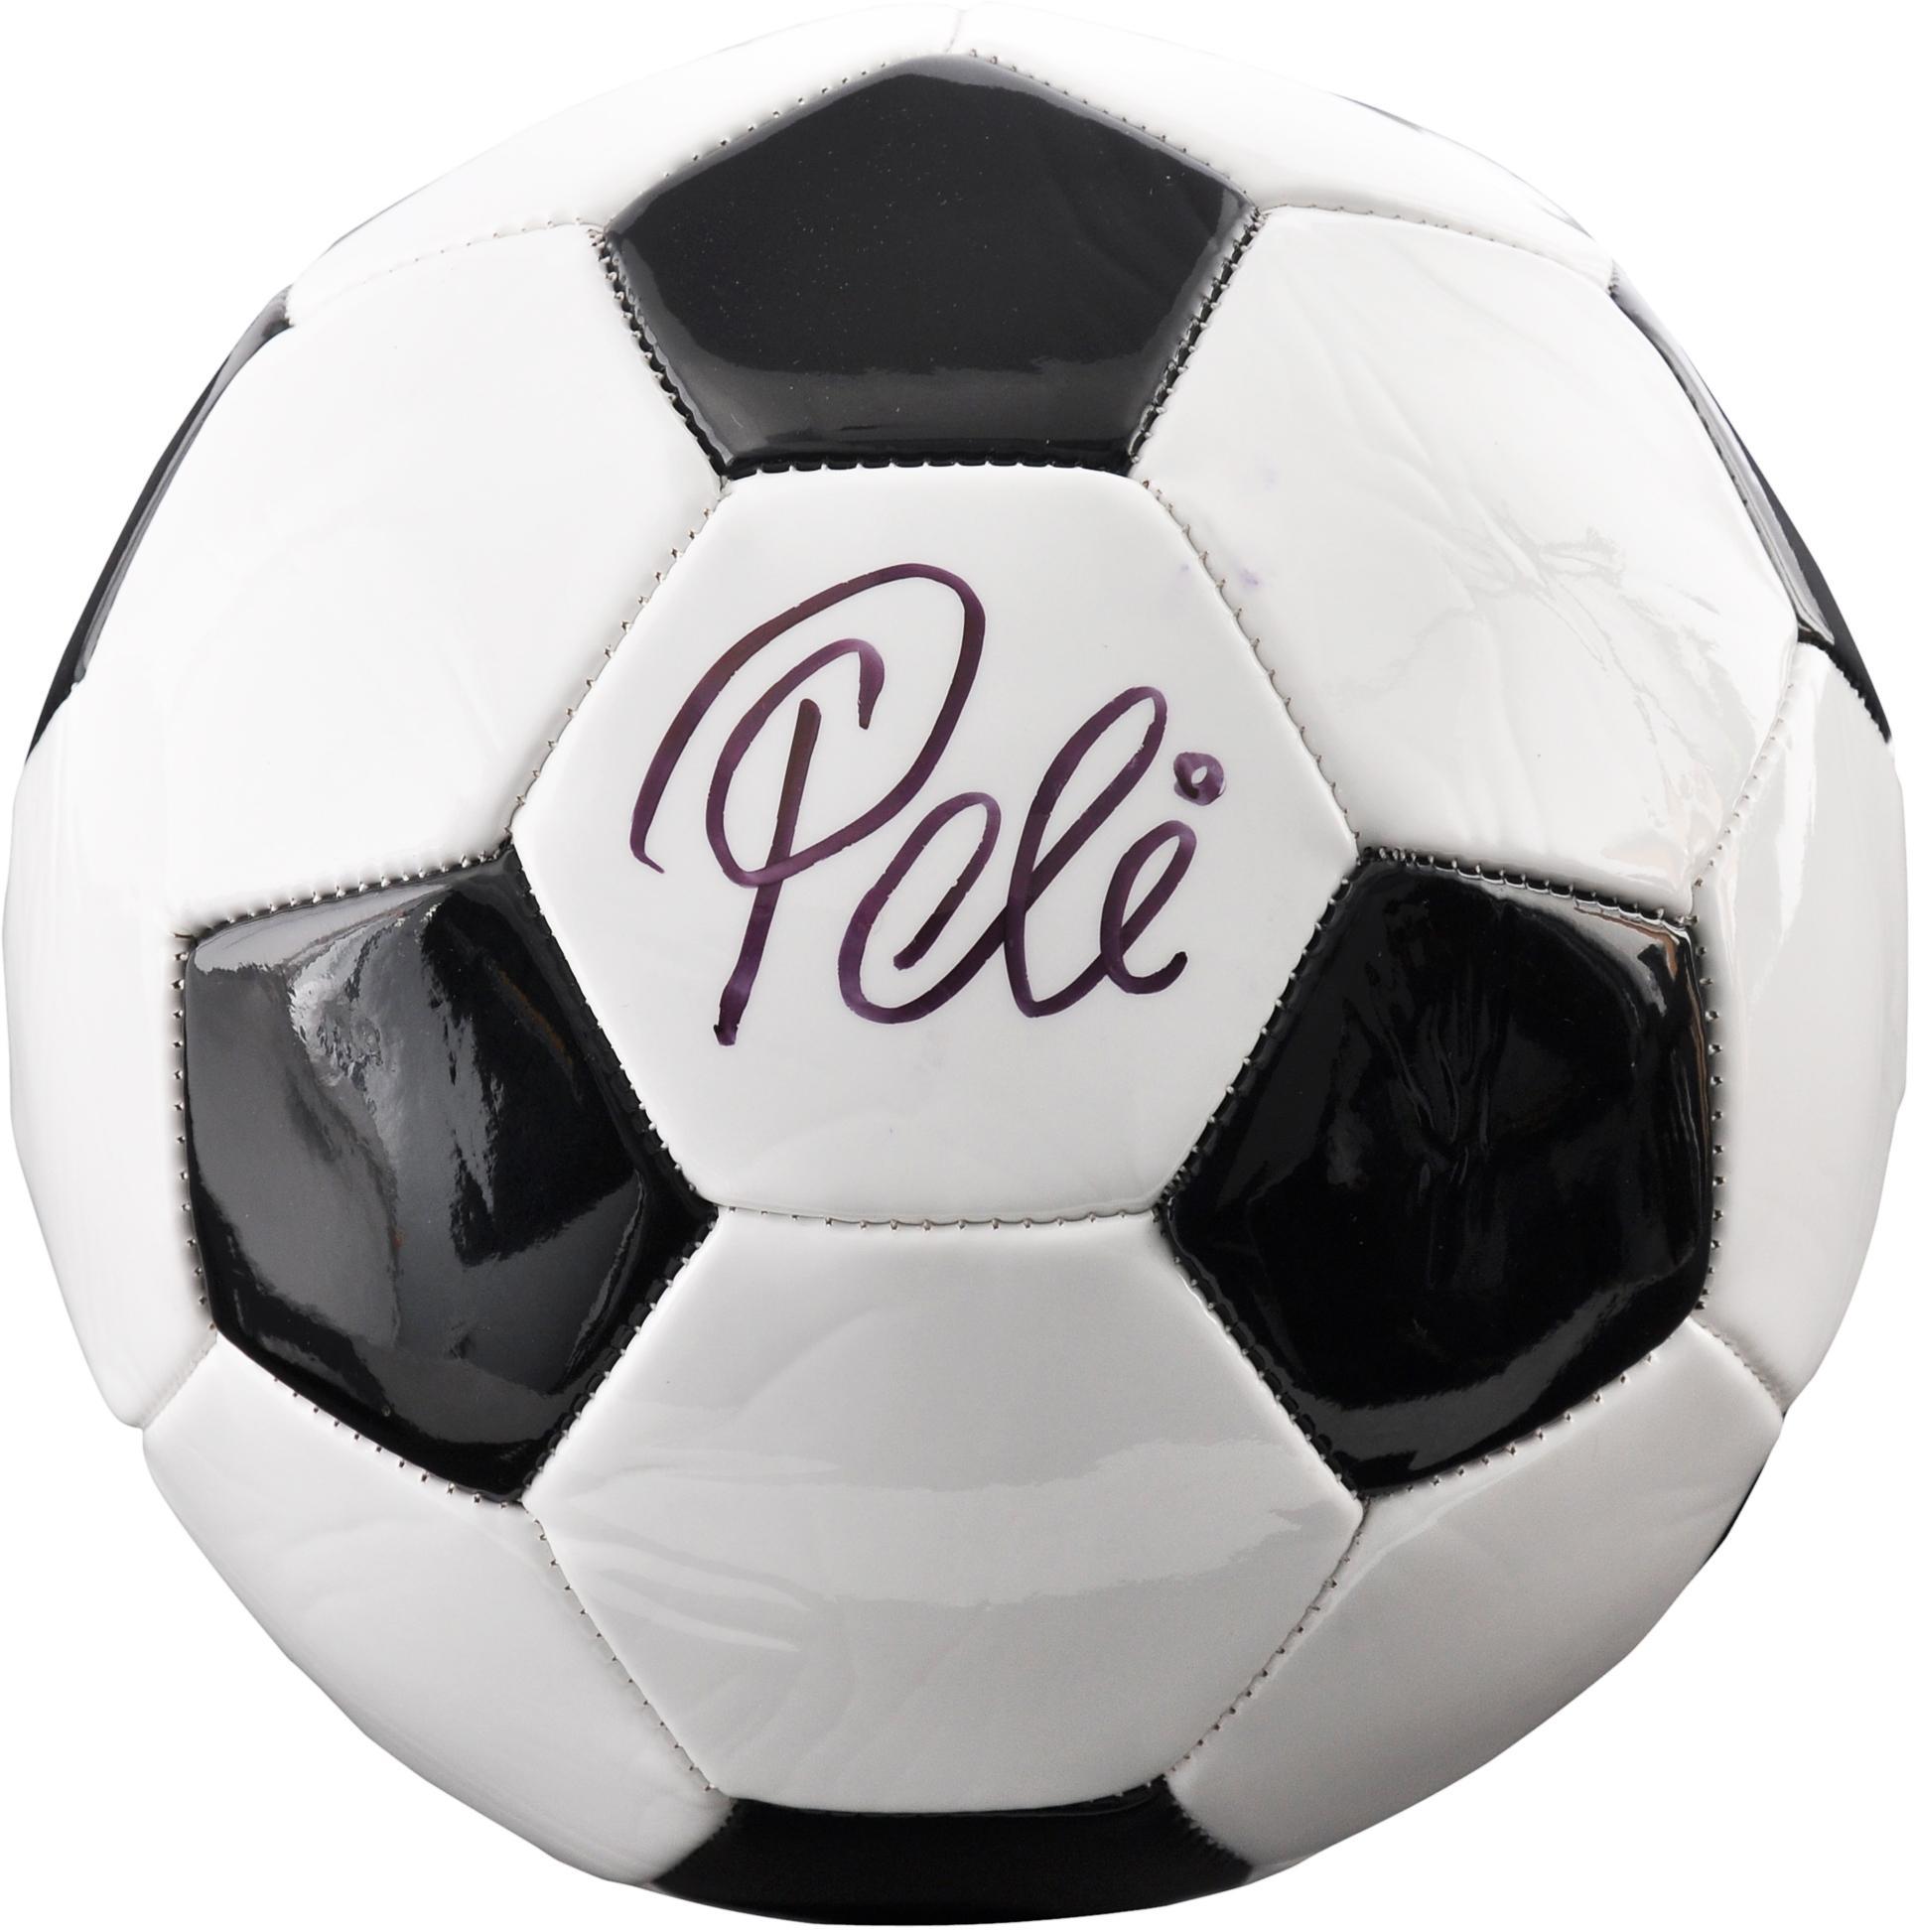 Pele Brazil Autographed Baden Soccer Ball